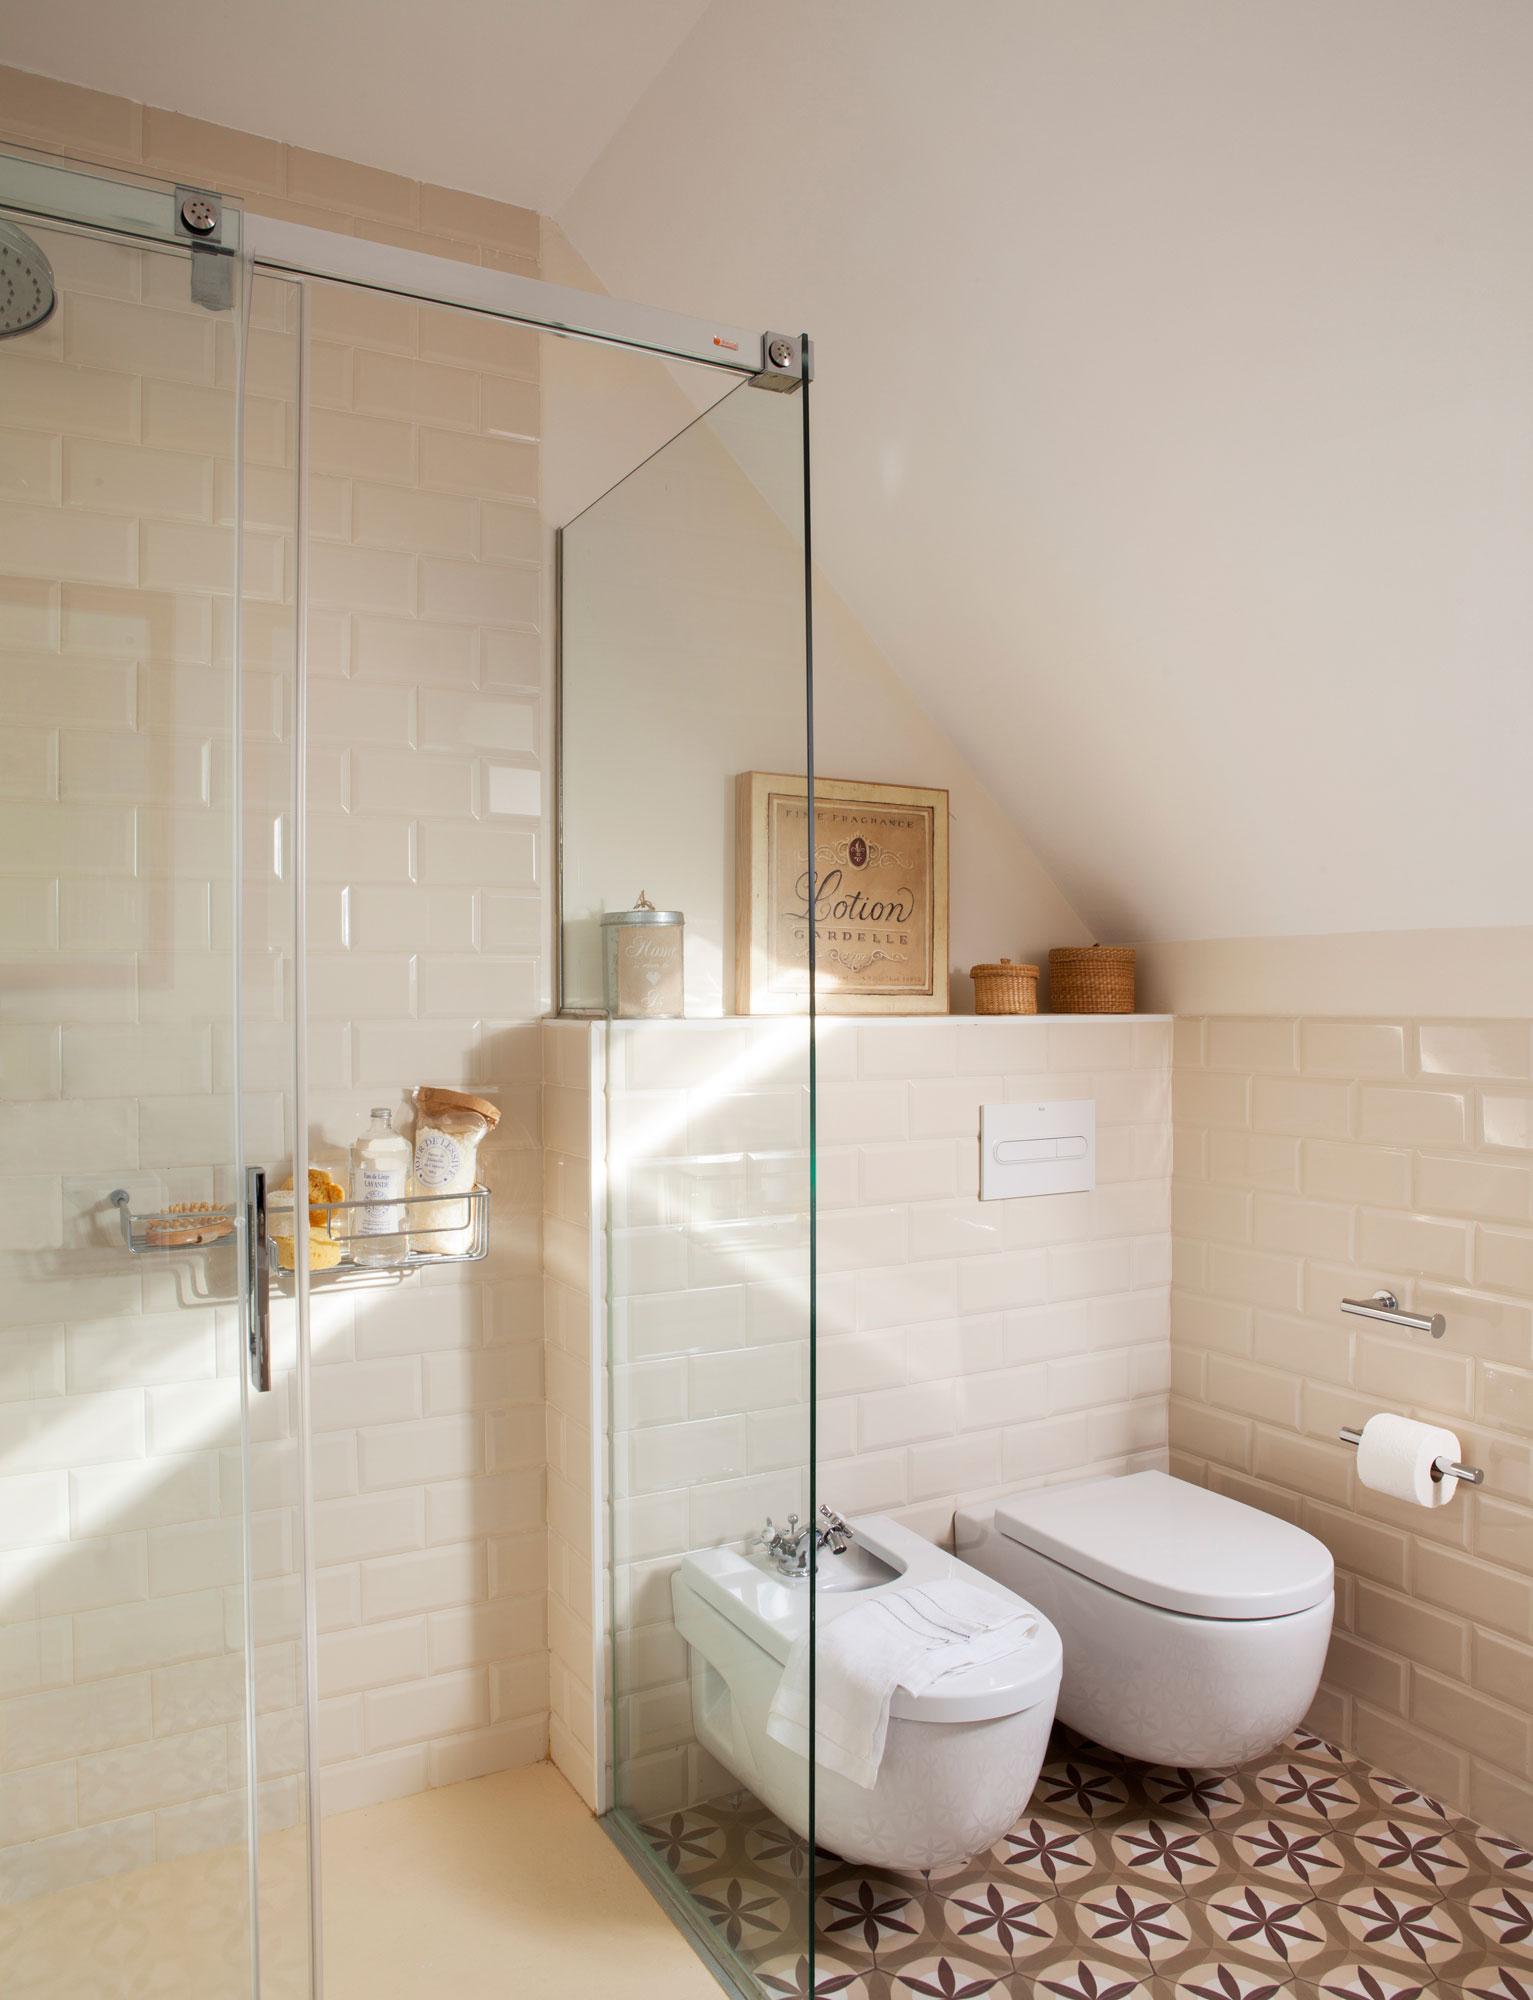 C mo renovar tu casa en solo un fin de semana for Poner ducha en bano pequeno